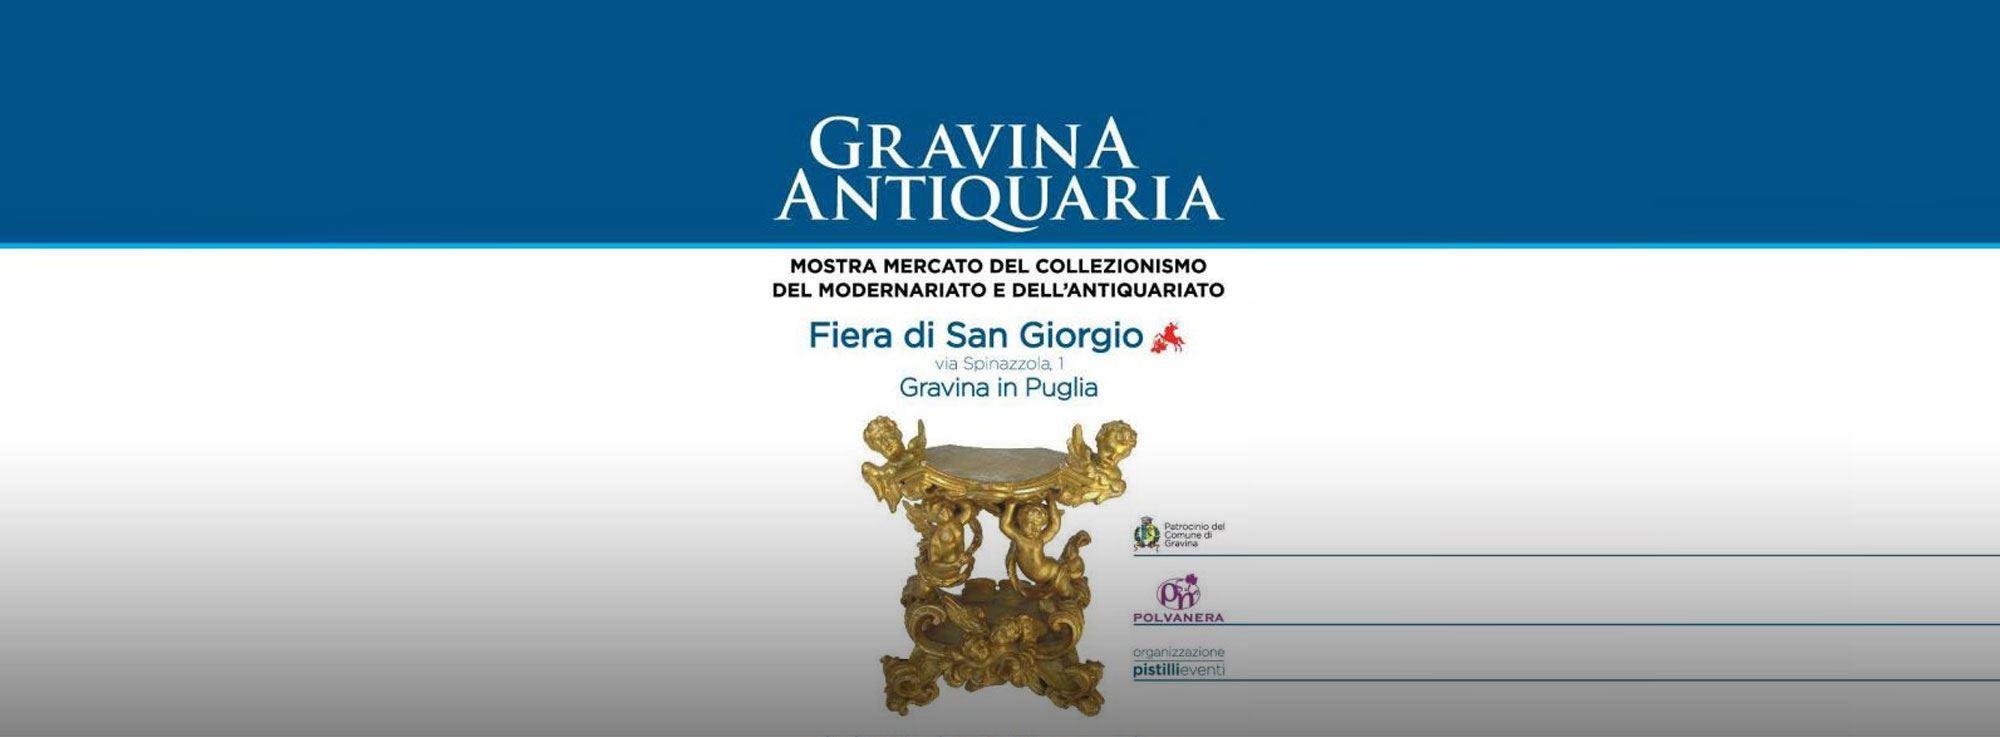 Gravina in Puglia: Gravina Antiquaria 2016